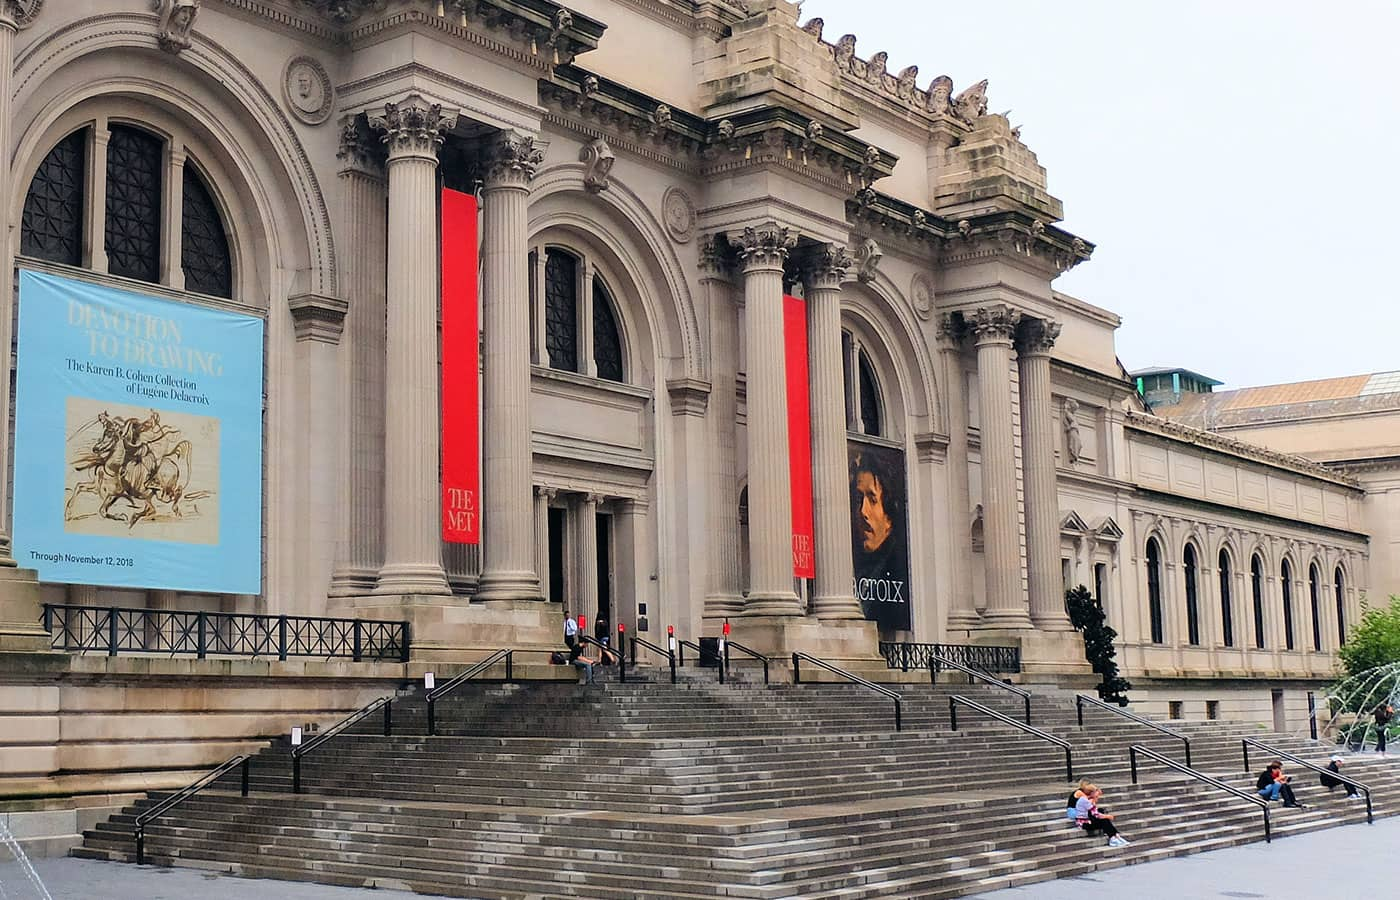 Diferença entre New York Sightseeing Flex Pass e Sightseeing Day Pass - The Met